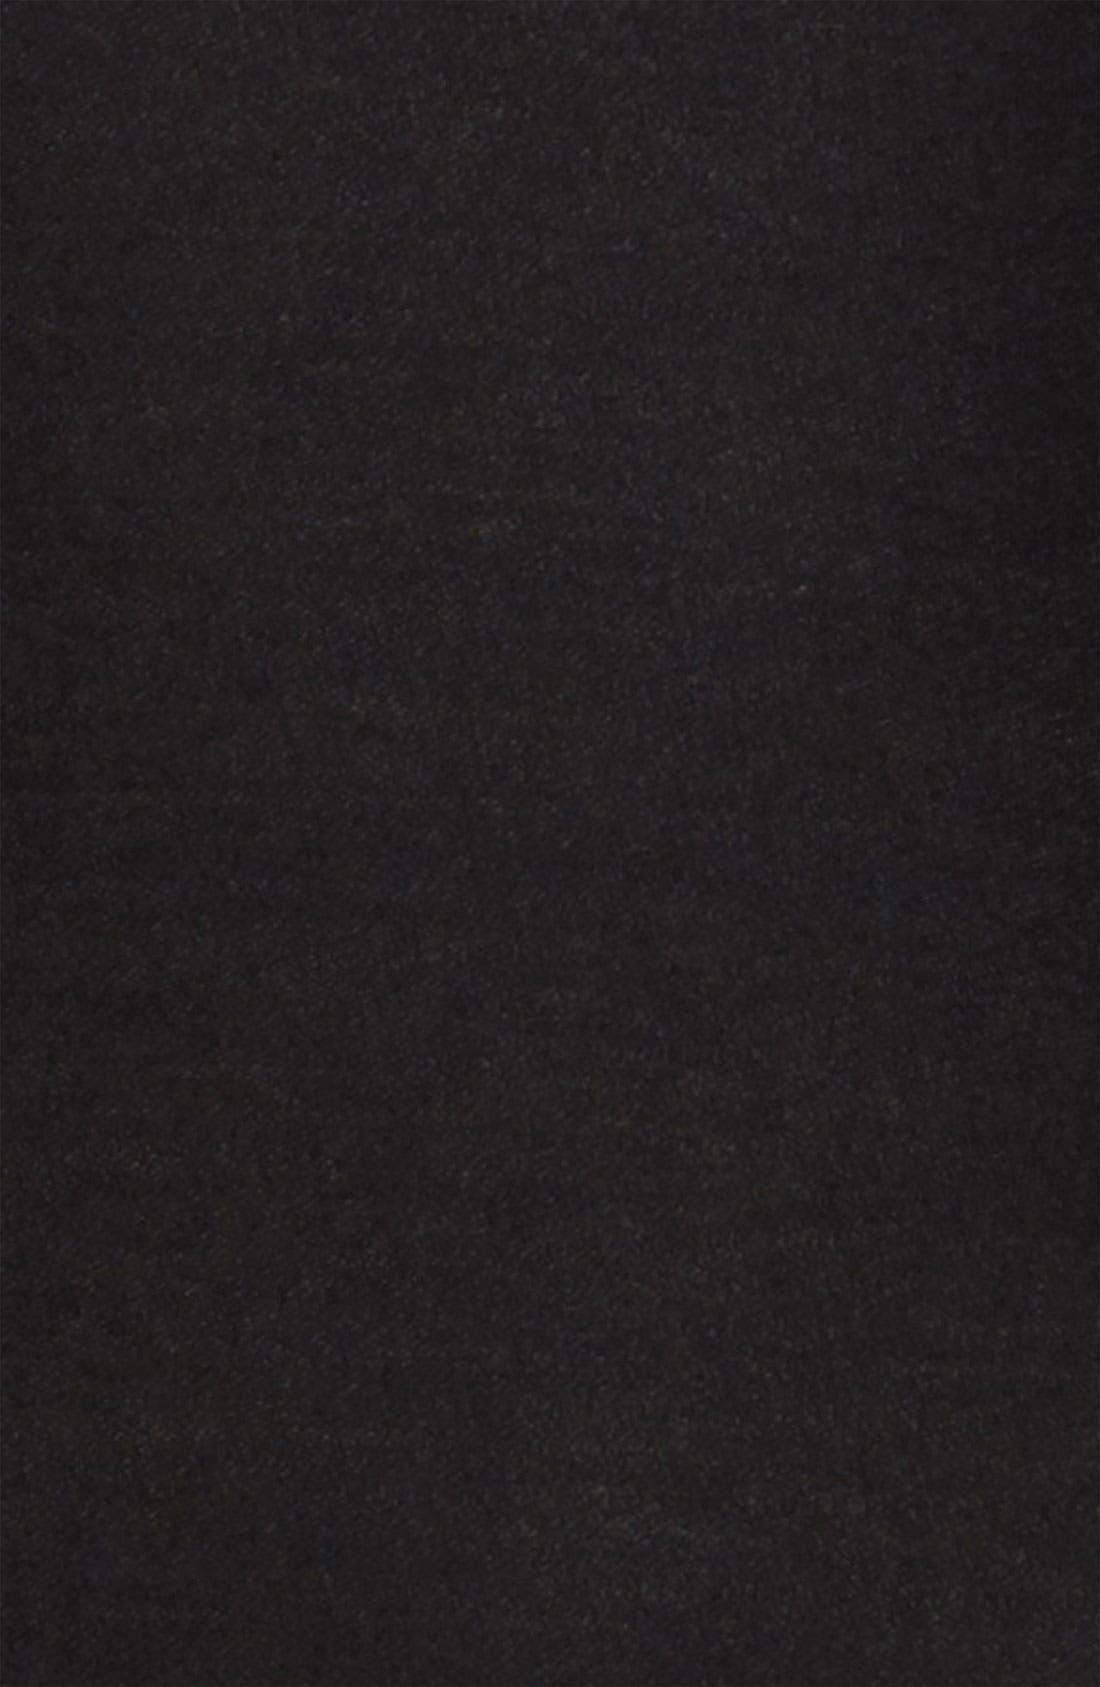 Alternate Image 3  - ASTR Cutout Back Maxi Dress